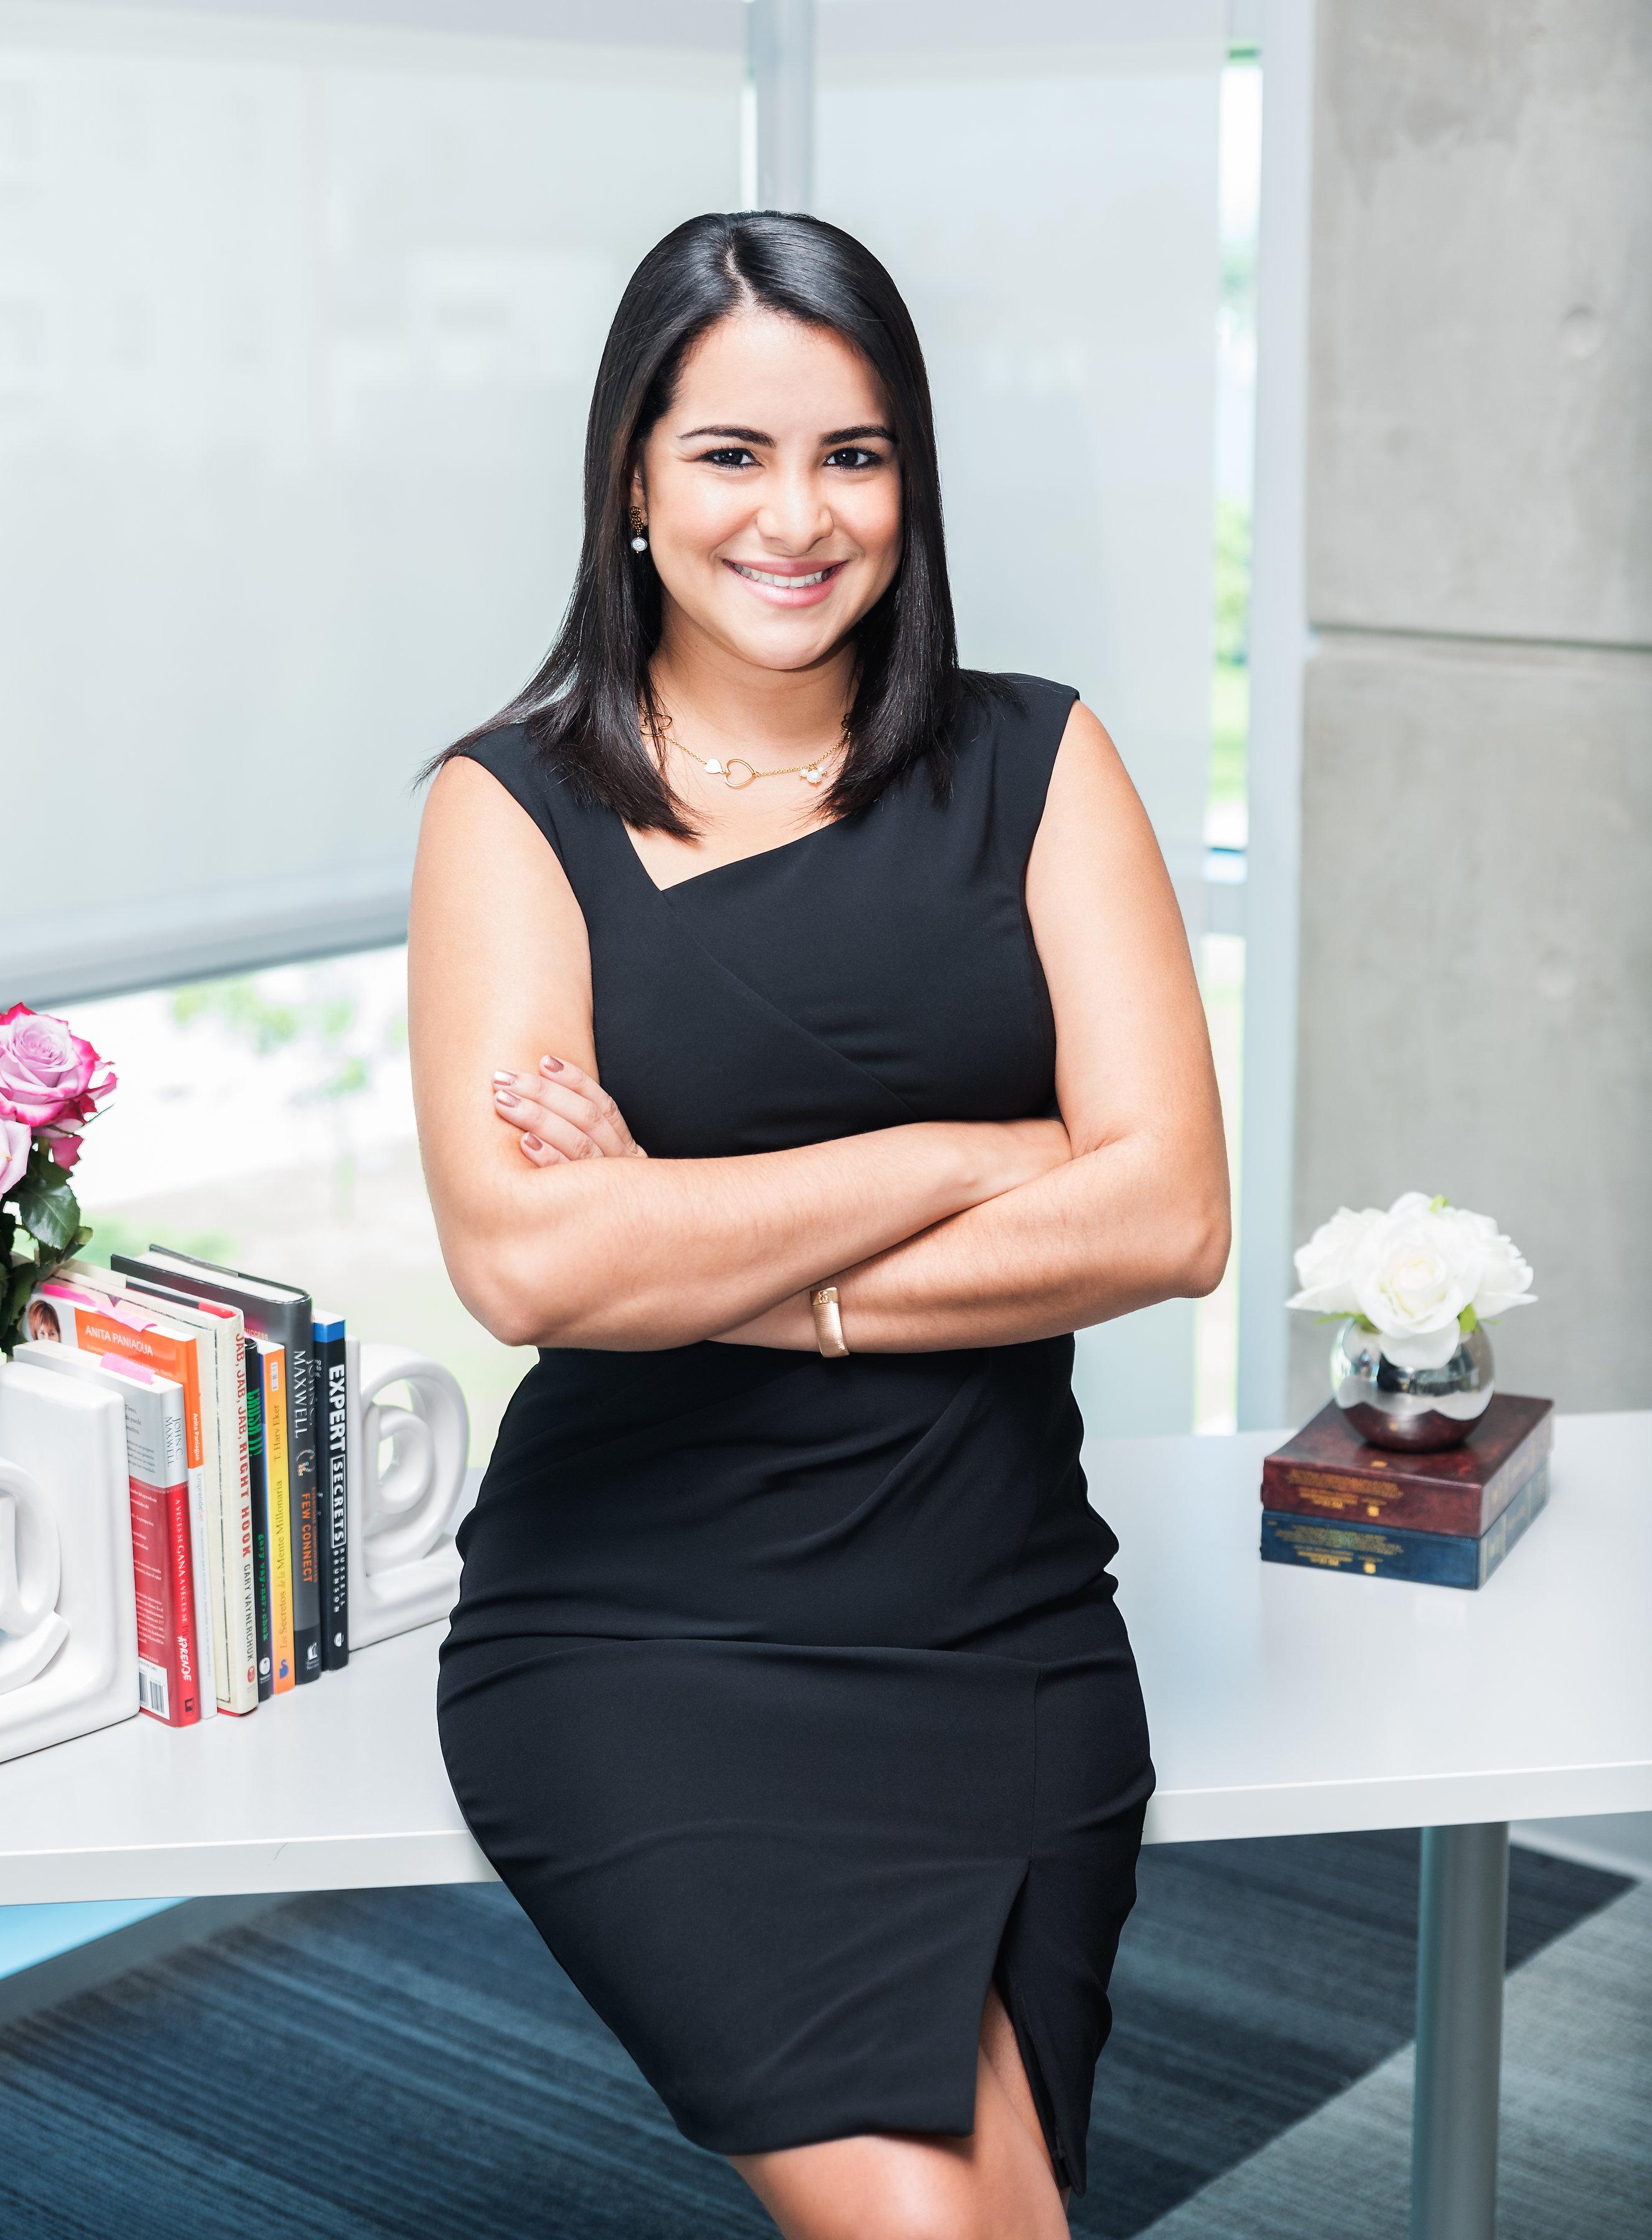 Ing. Veronica Aviles